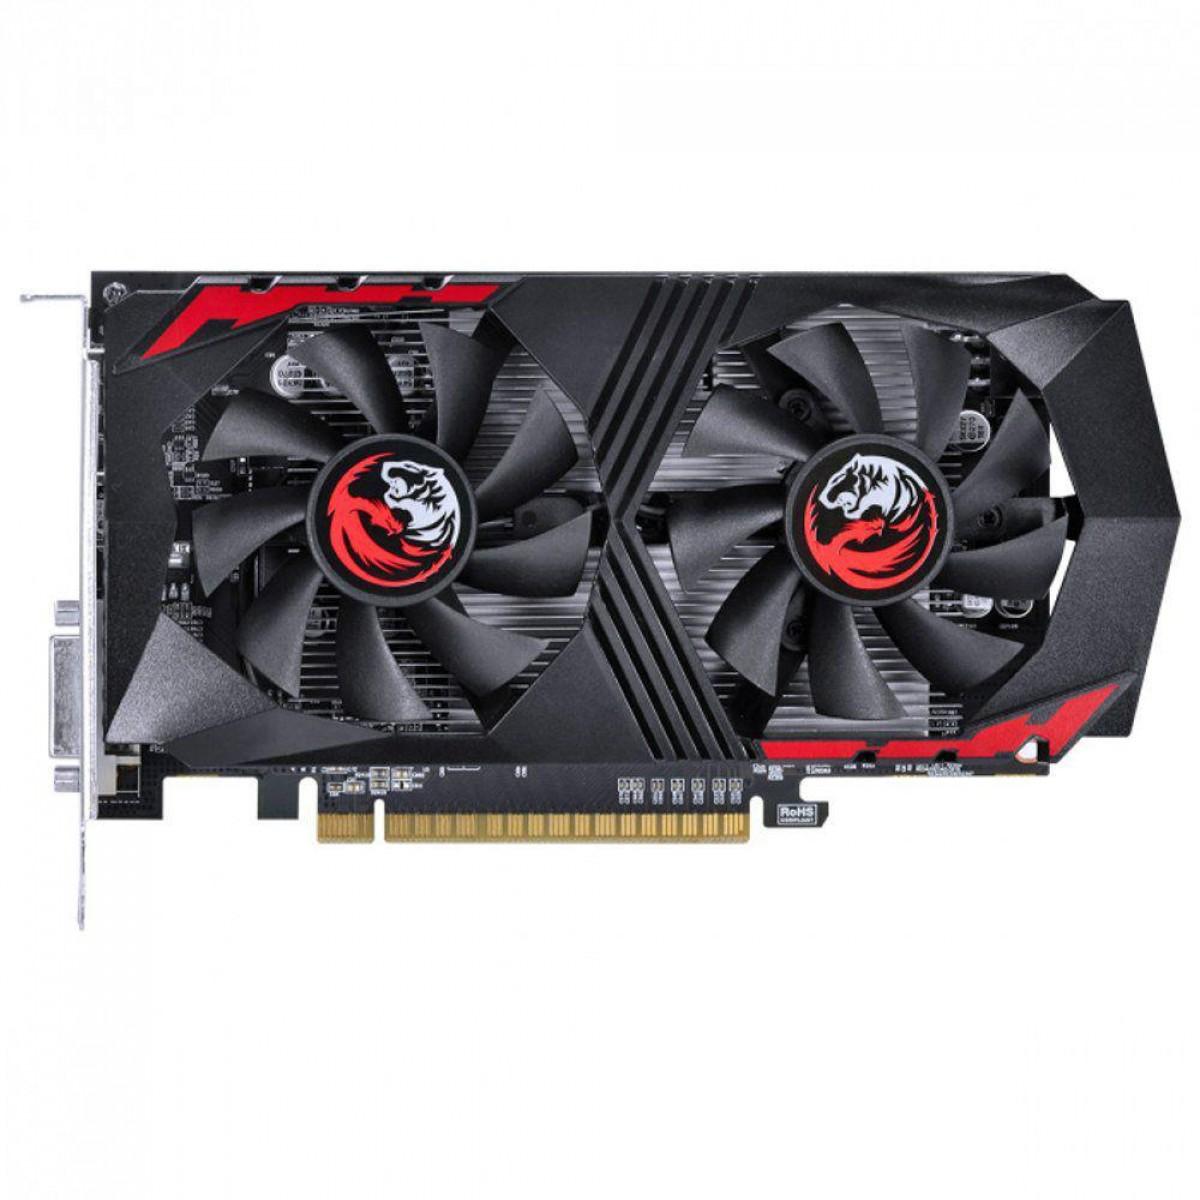 Placa de Vídeo PCYes, GeForce, GTX 1050 TI Graffiti Series, Dual, 4GB, GDDR5, 128Bit, PA1050TI12804G5DF